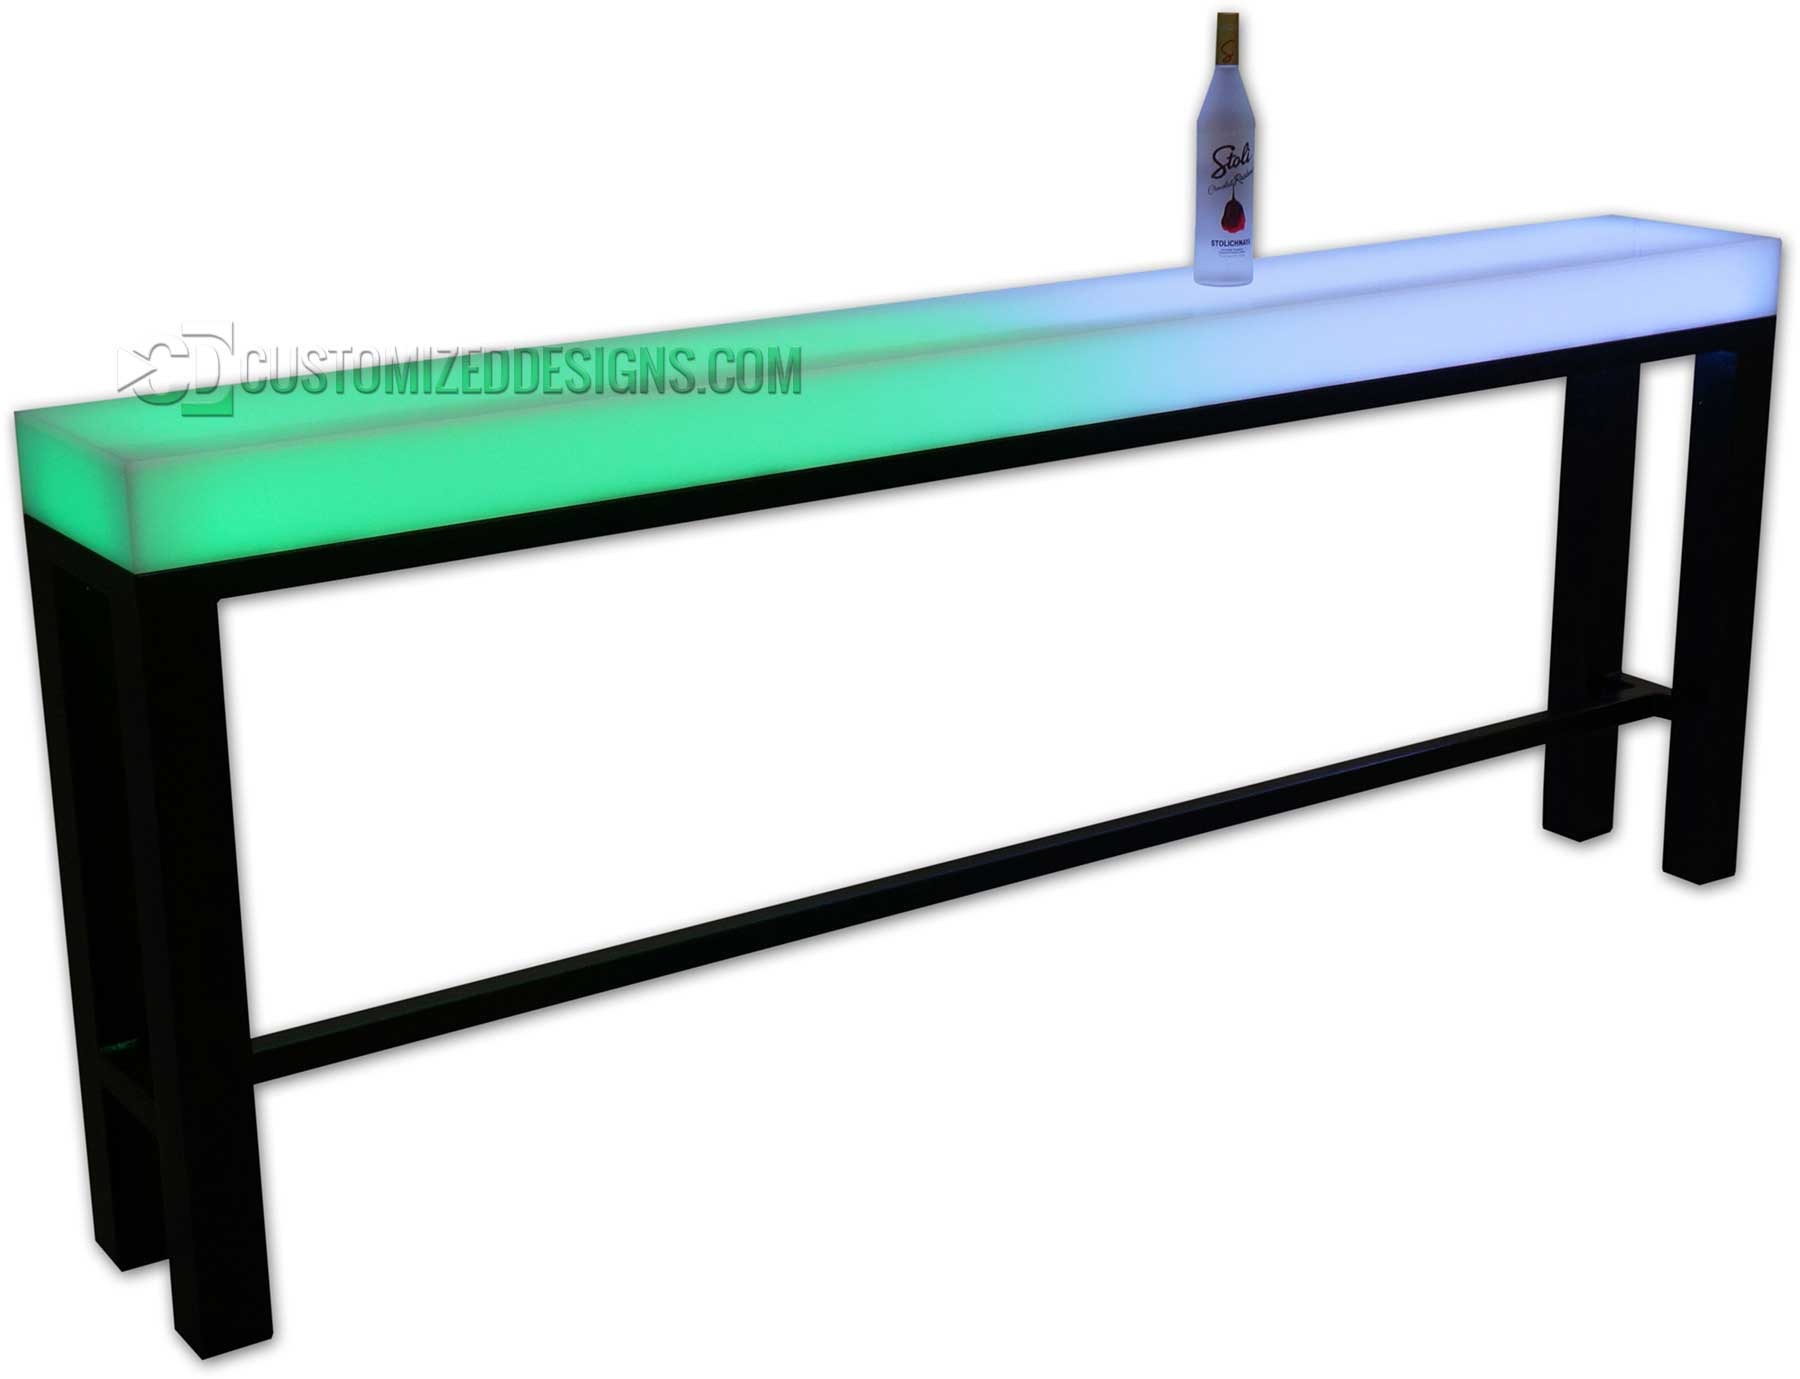 "Custom Aurora Highboy Table - 96"" x 12"" x 36"" H"